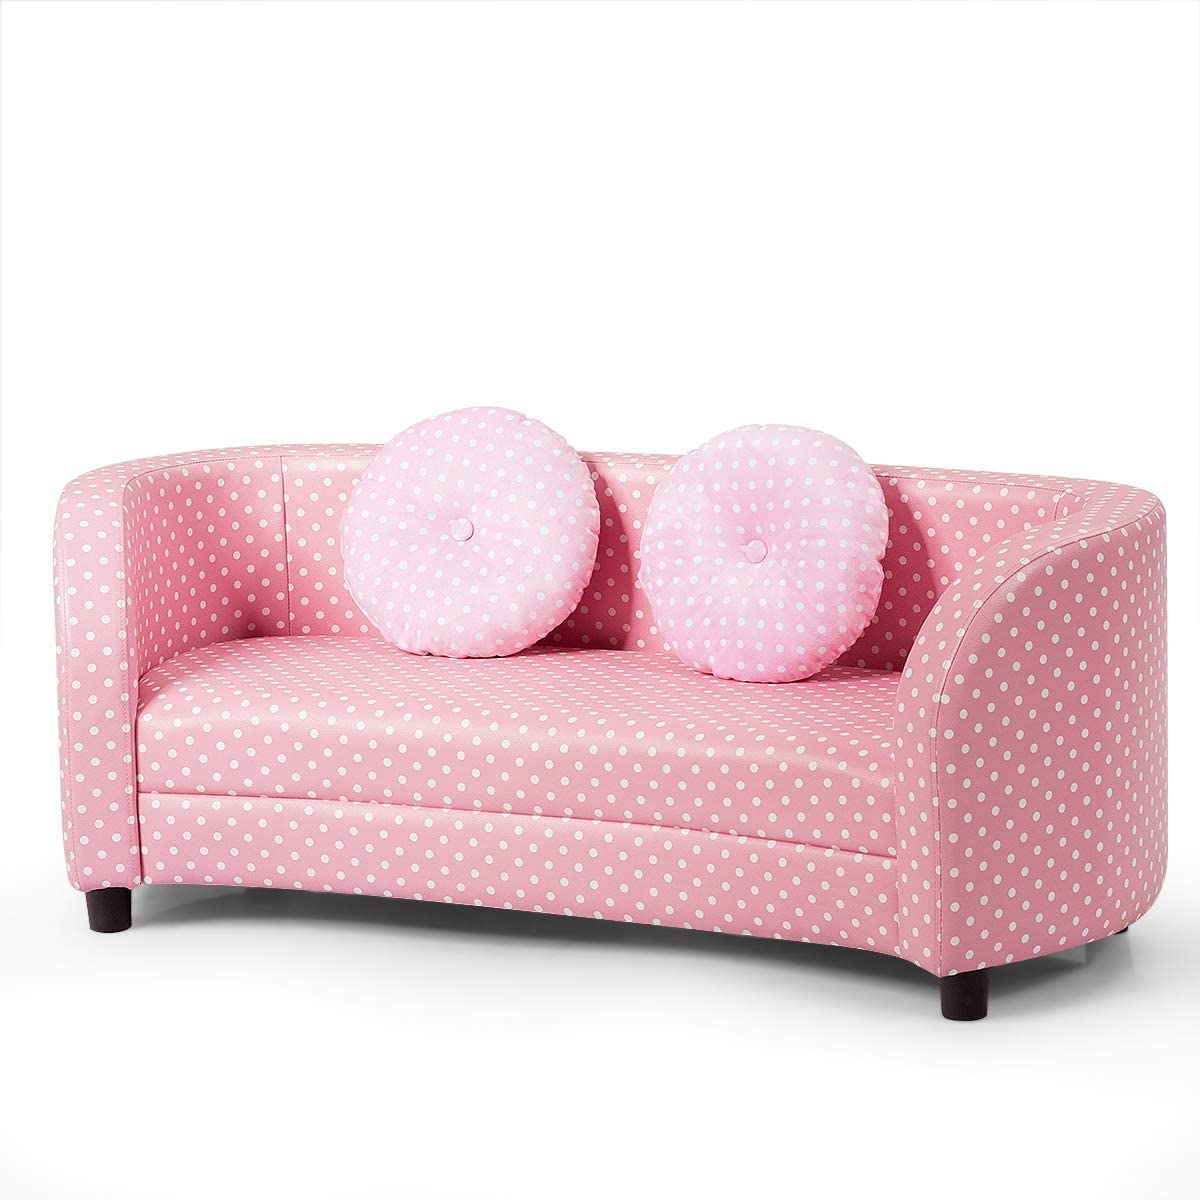 HONEY JOY Kids Sofa 2 Seater Two Armchair Toddler Round アウトレット w Pillo 大注目